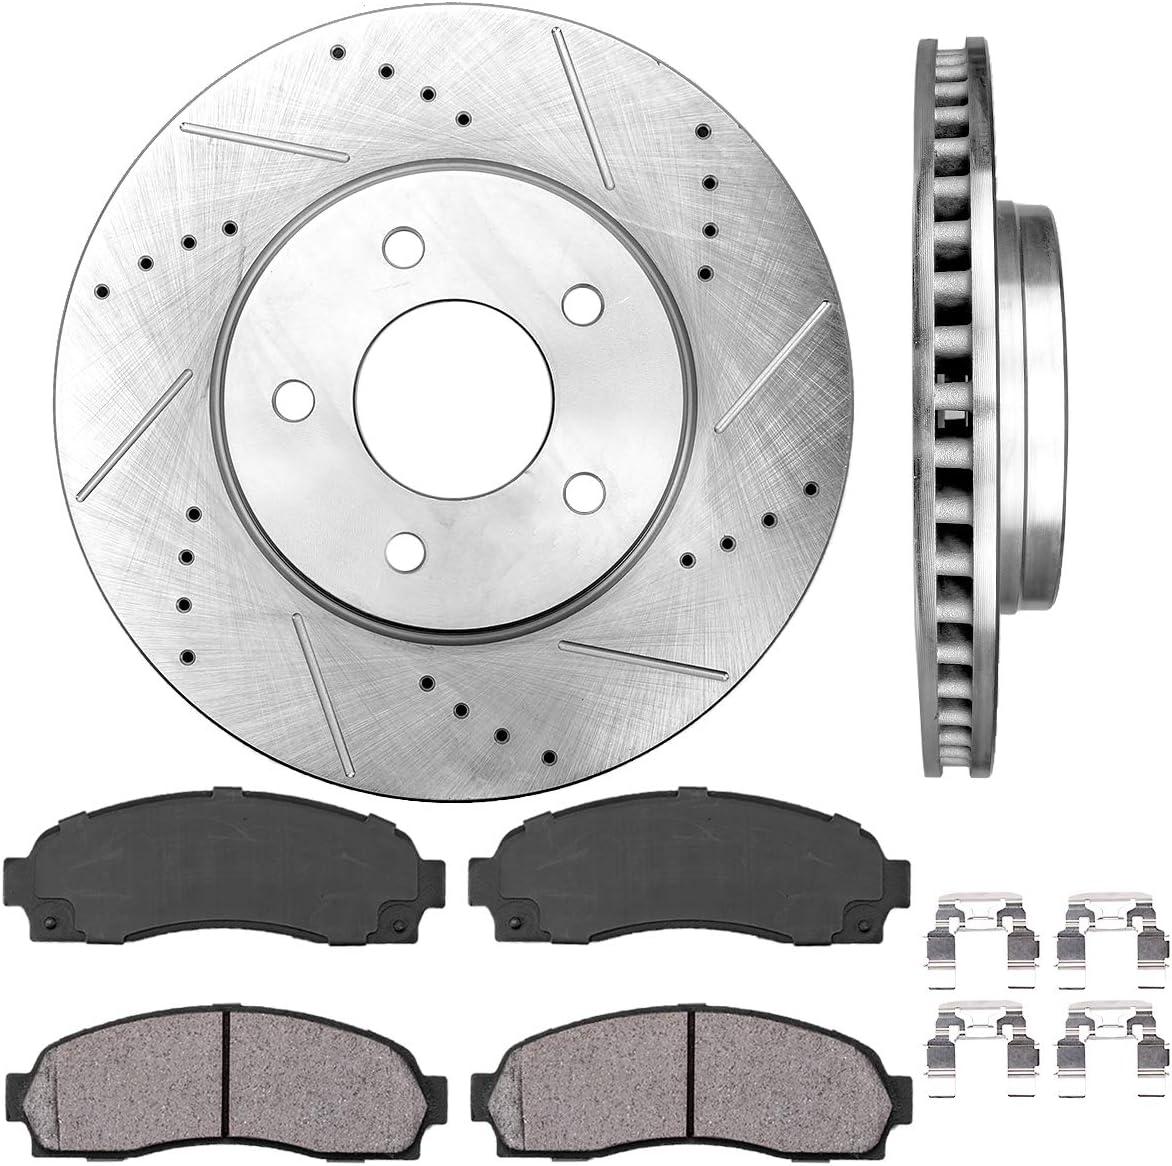 2006 Pontiac Torrent OE Replacement Rotors w//Ceramic Pads F